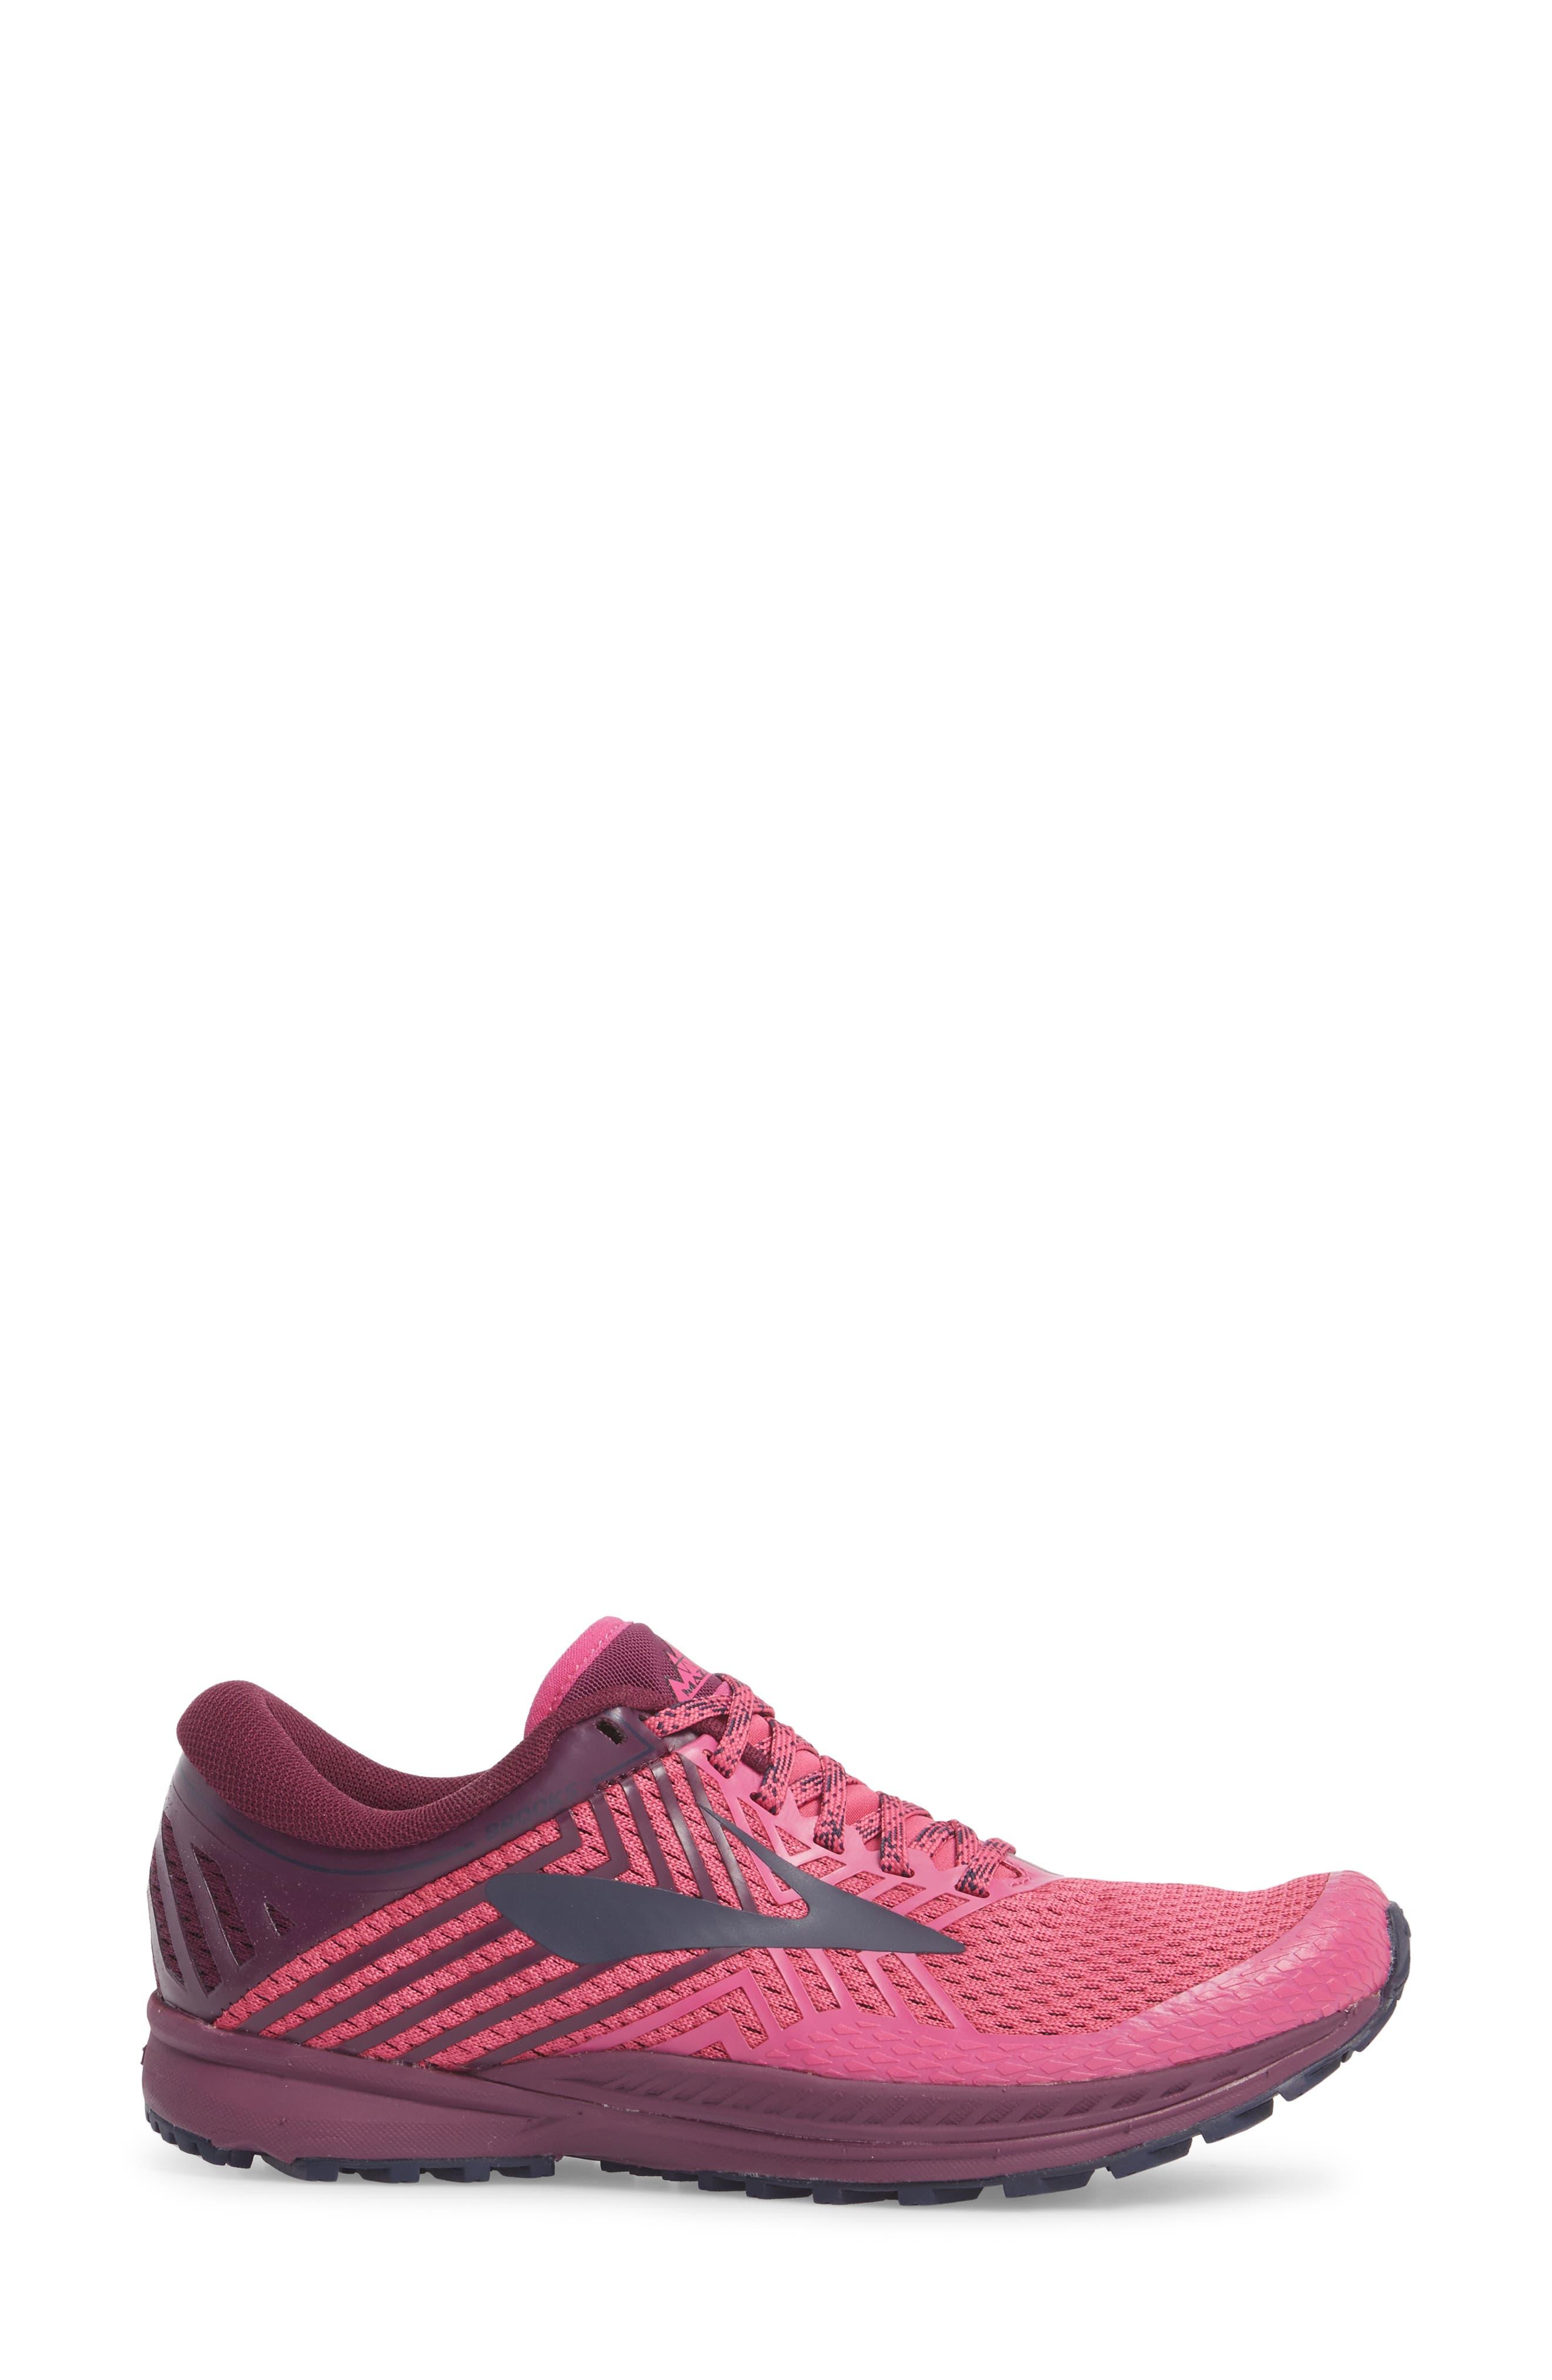 Mazama 2 Trail Running Shoe,                             Alternate thumbnail 3, color,                             PINK/ PLUM/ NAVY